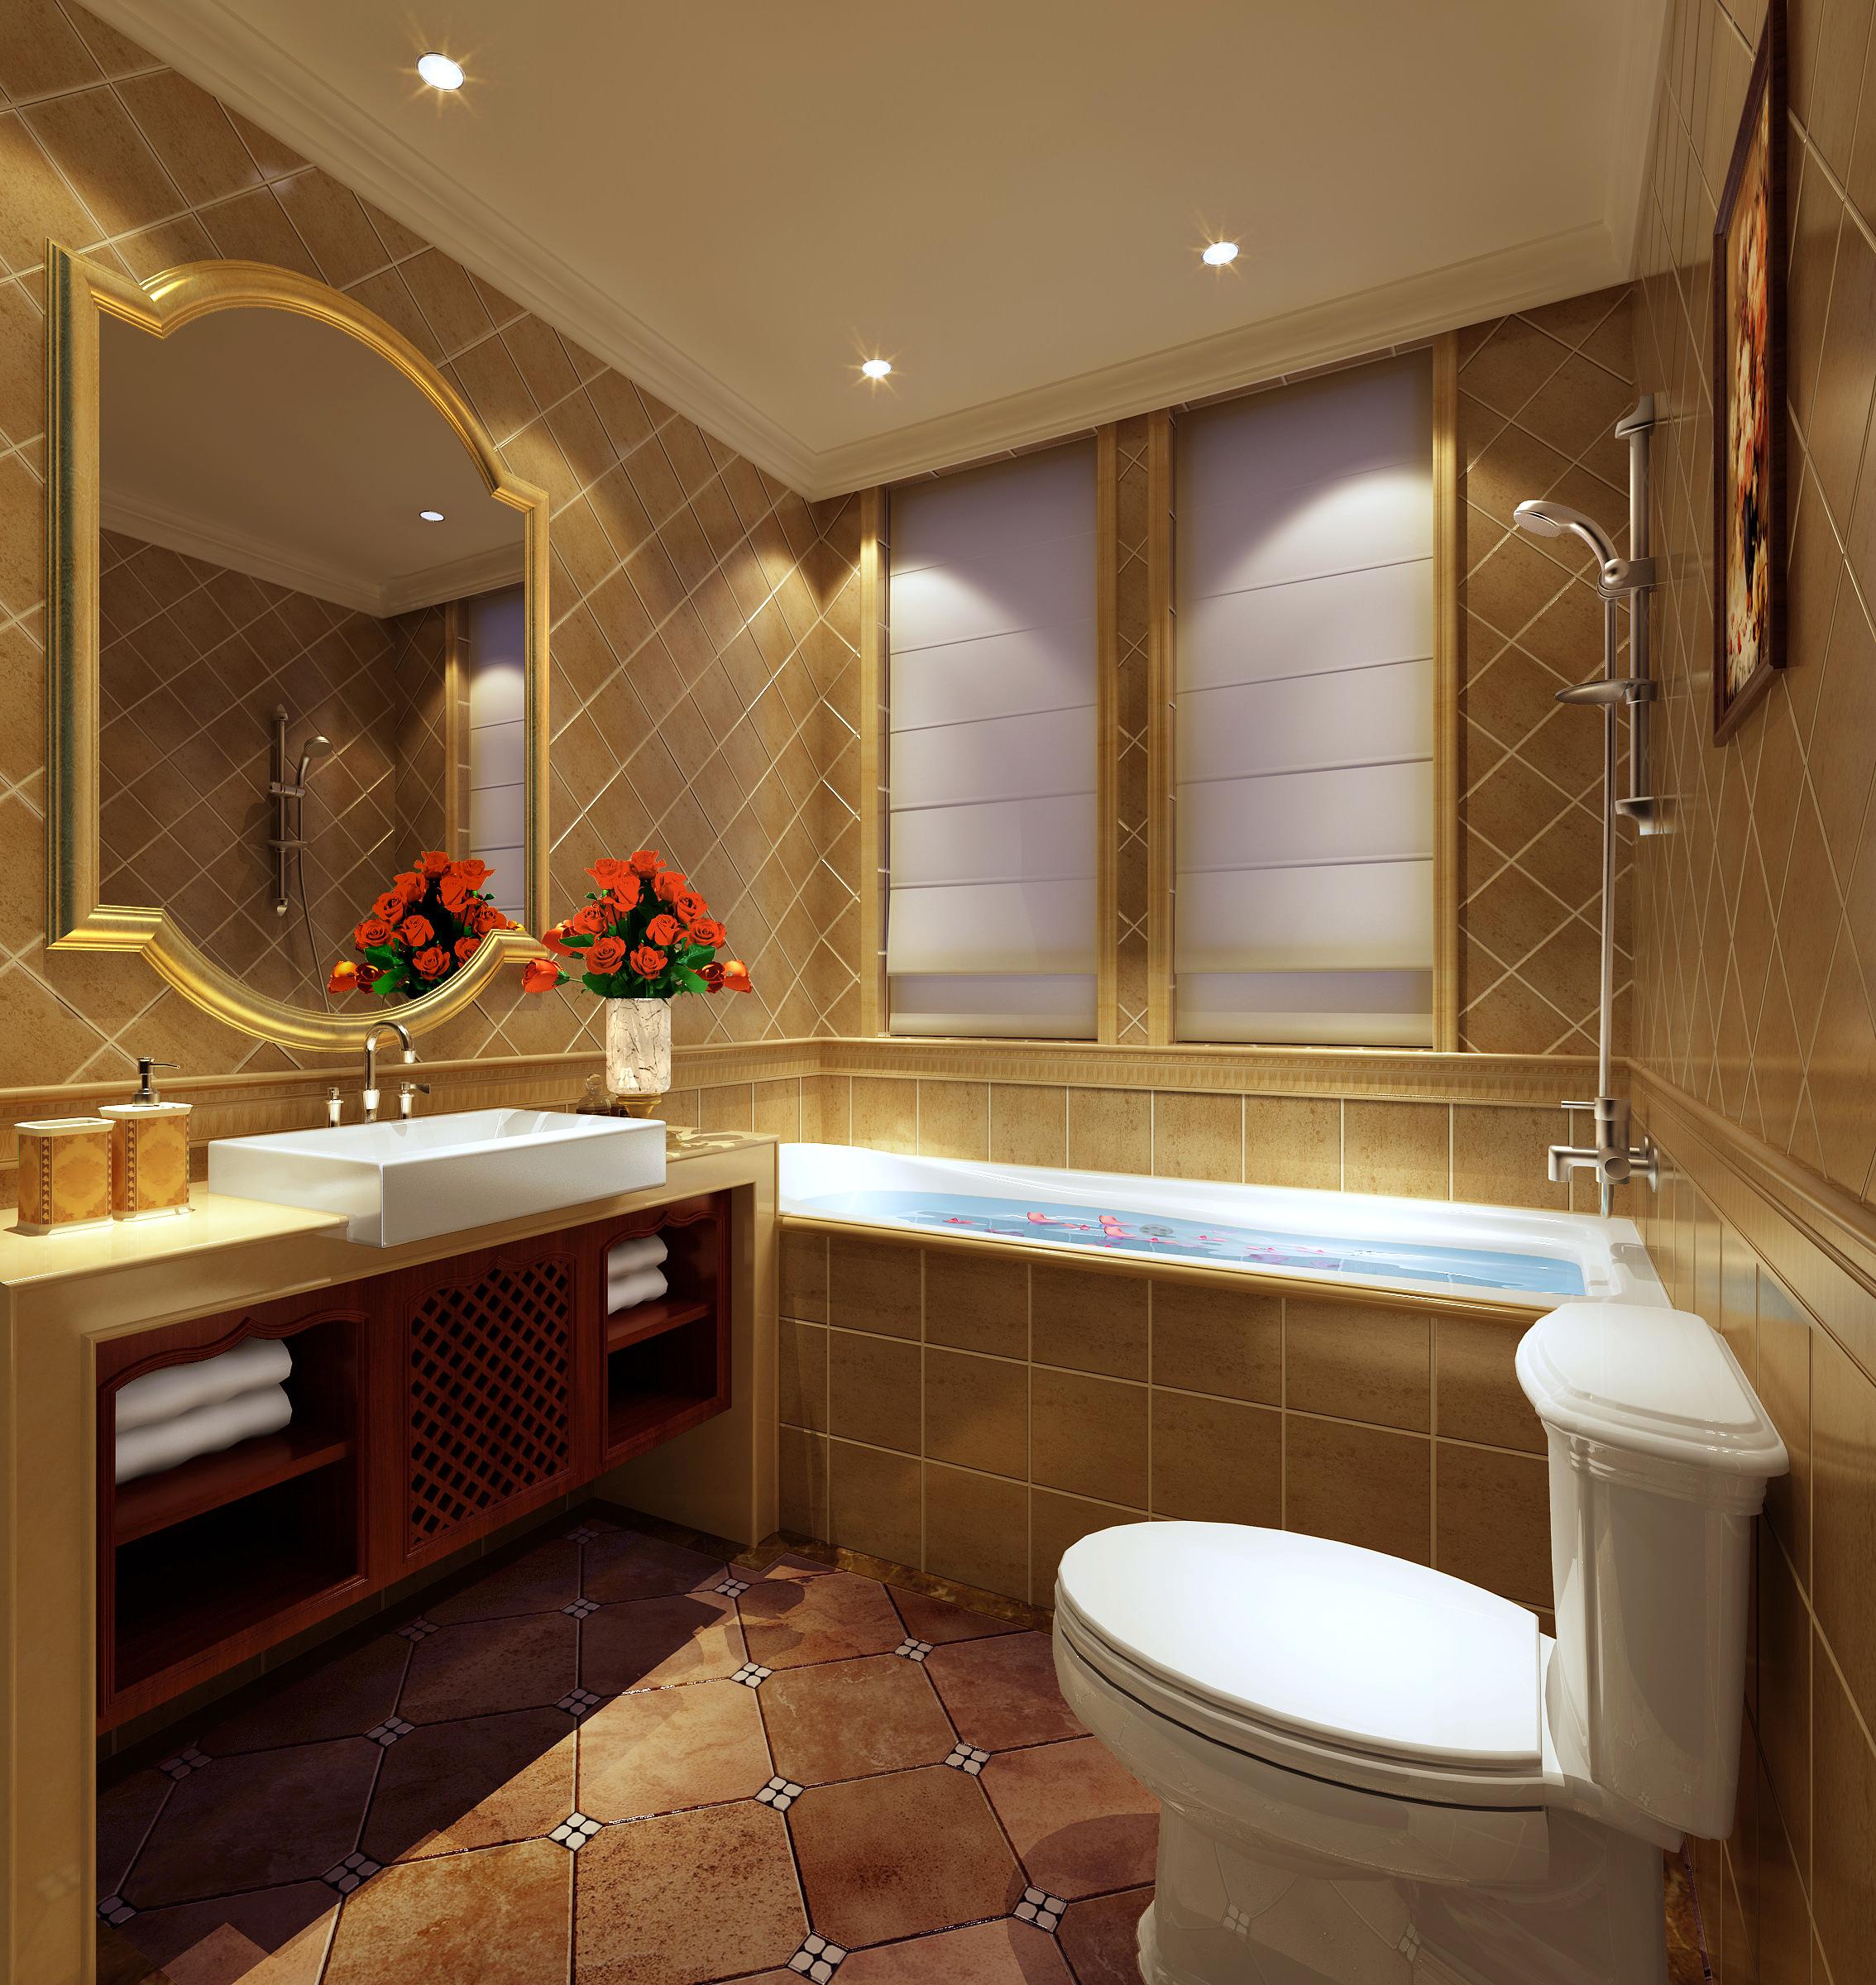 Bathroom D Model Bathroom E D Model Luxury Architectural Bathroom